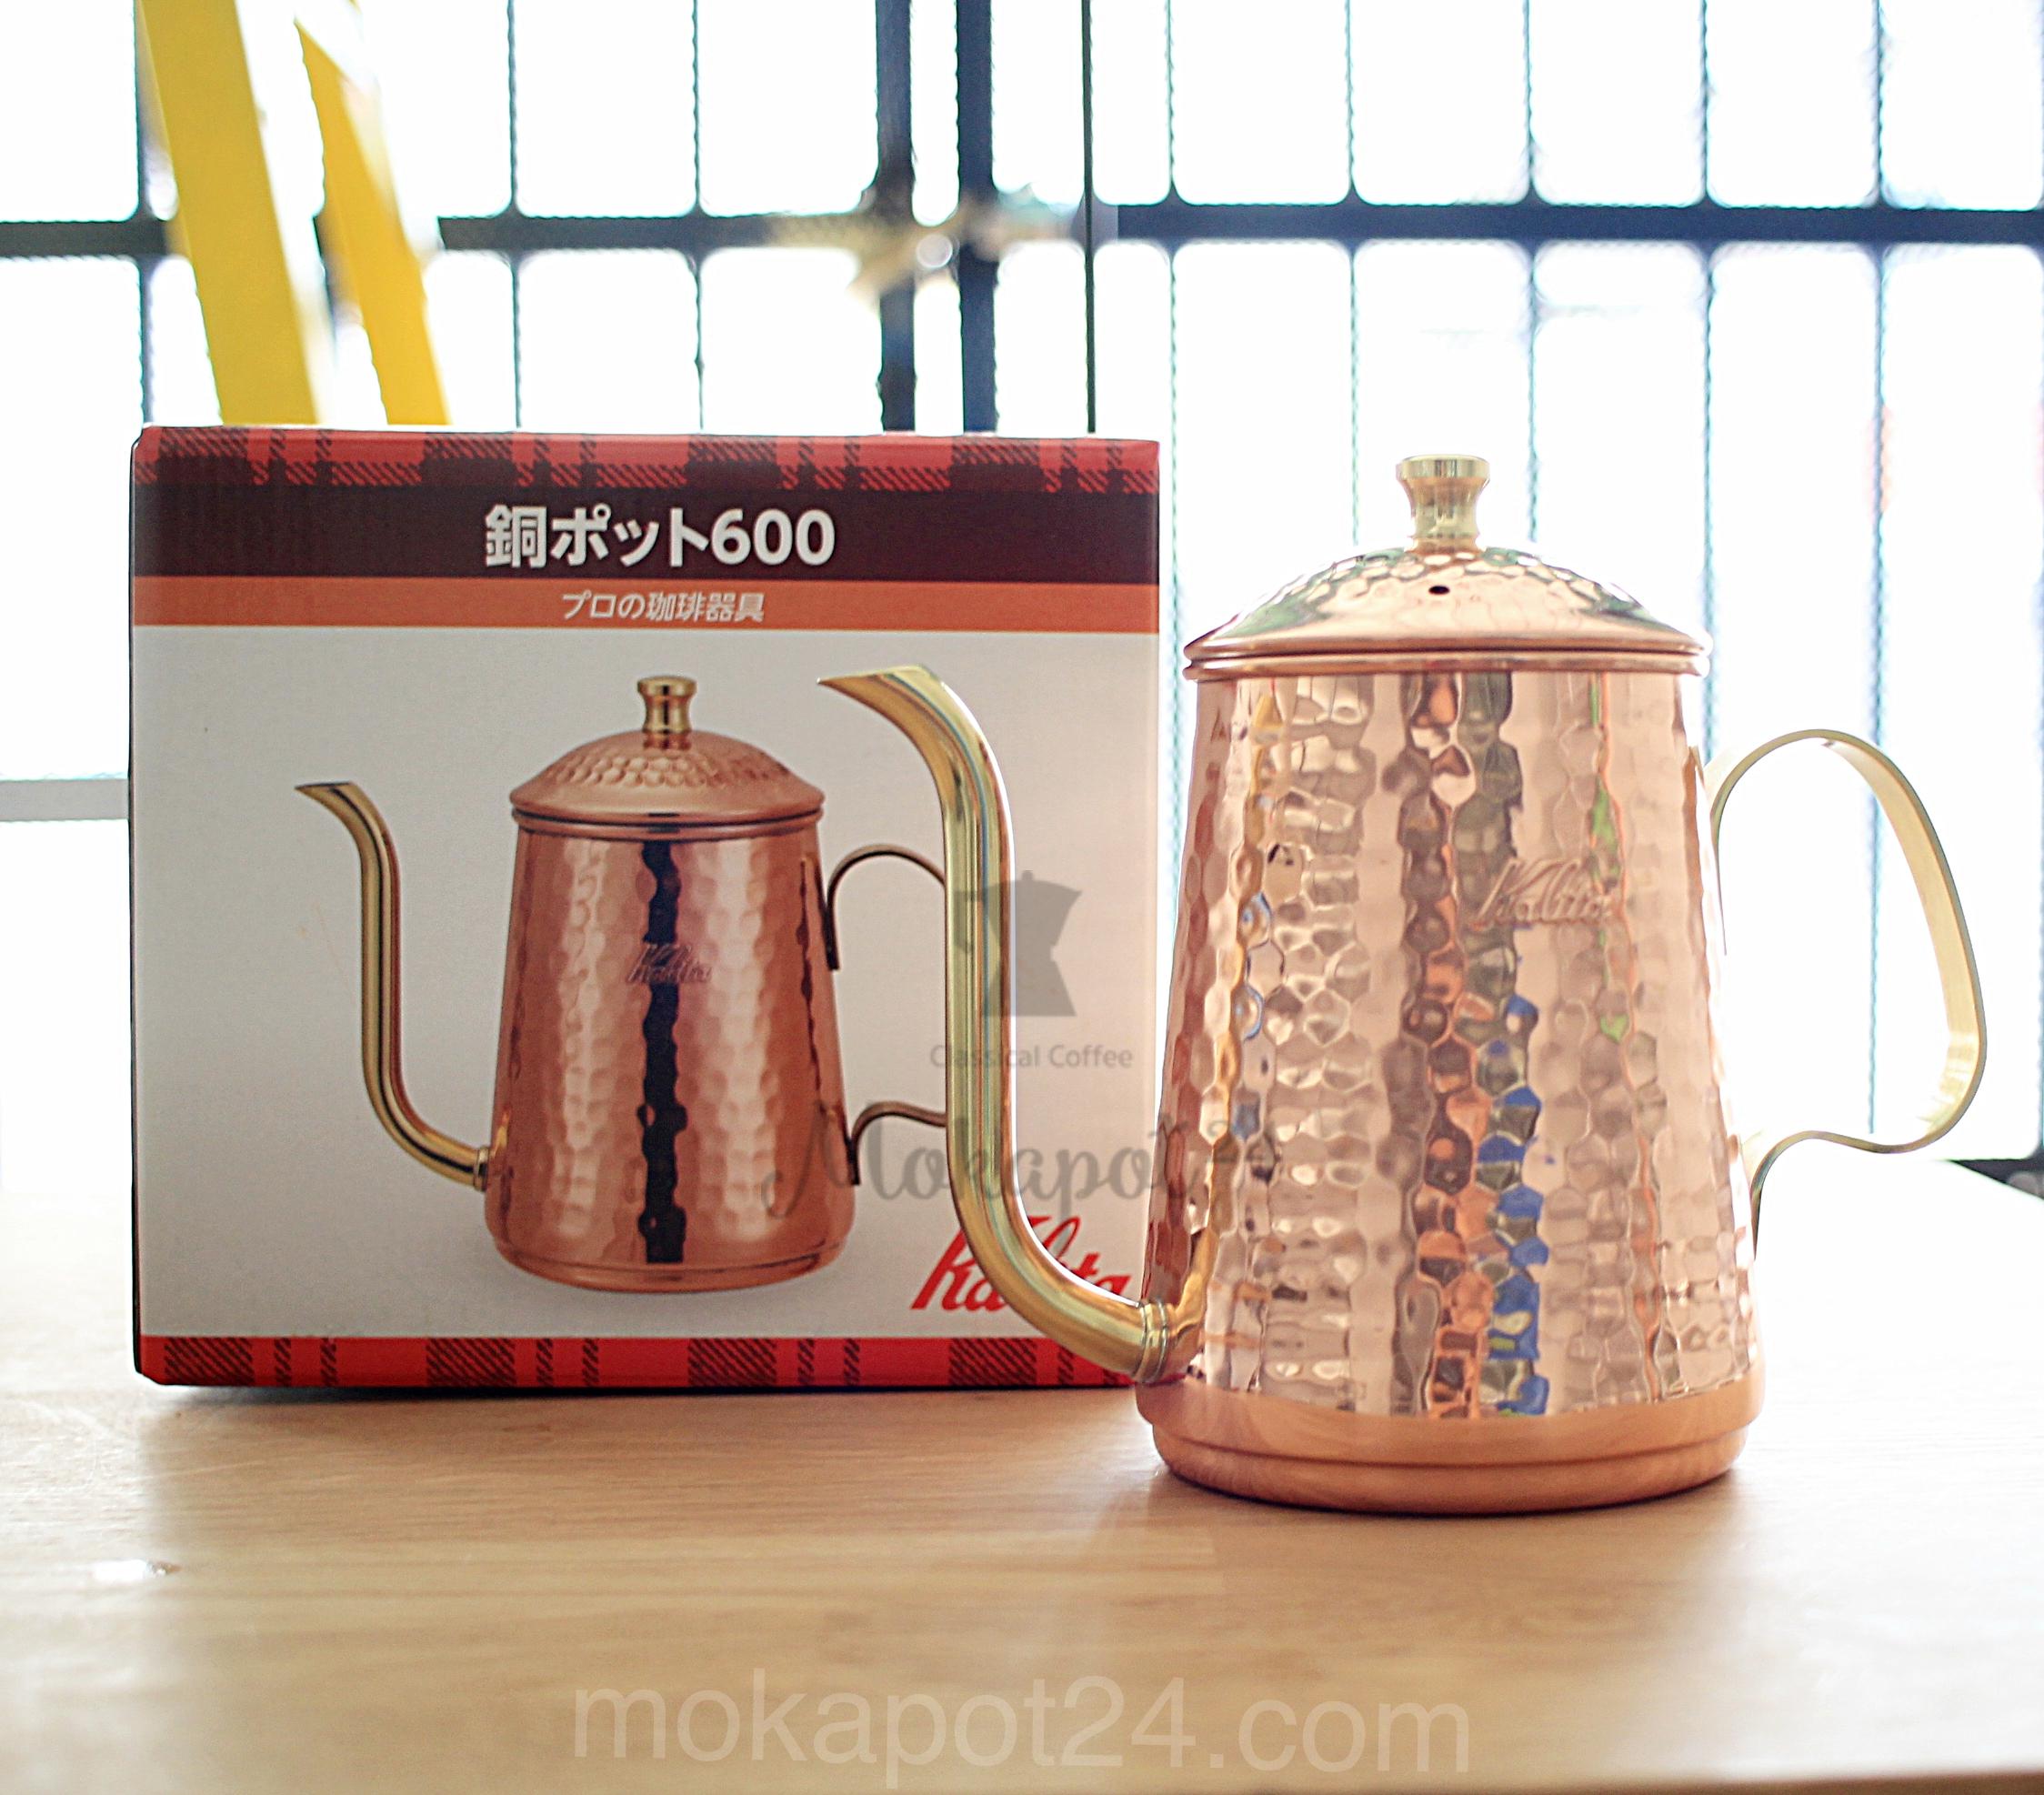 Kalita Coffee Drip Kettle กาดริปกาแฟ Copper Pot 600ml (Bronze)